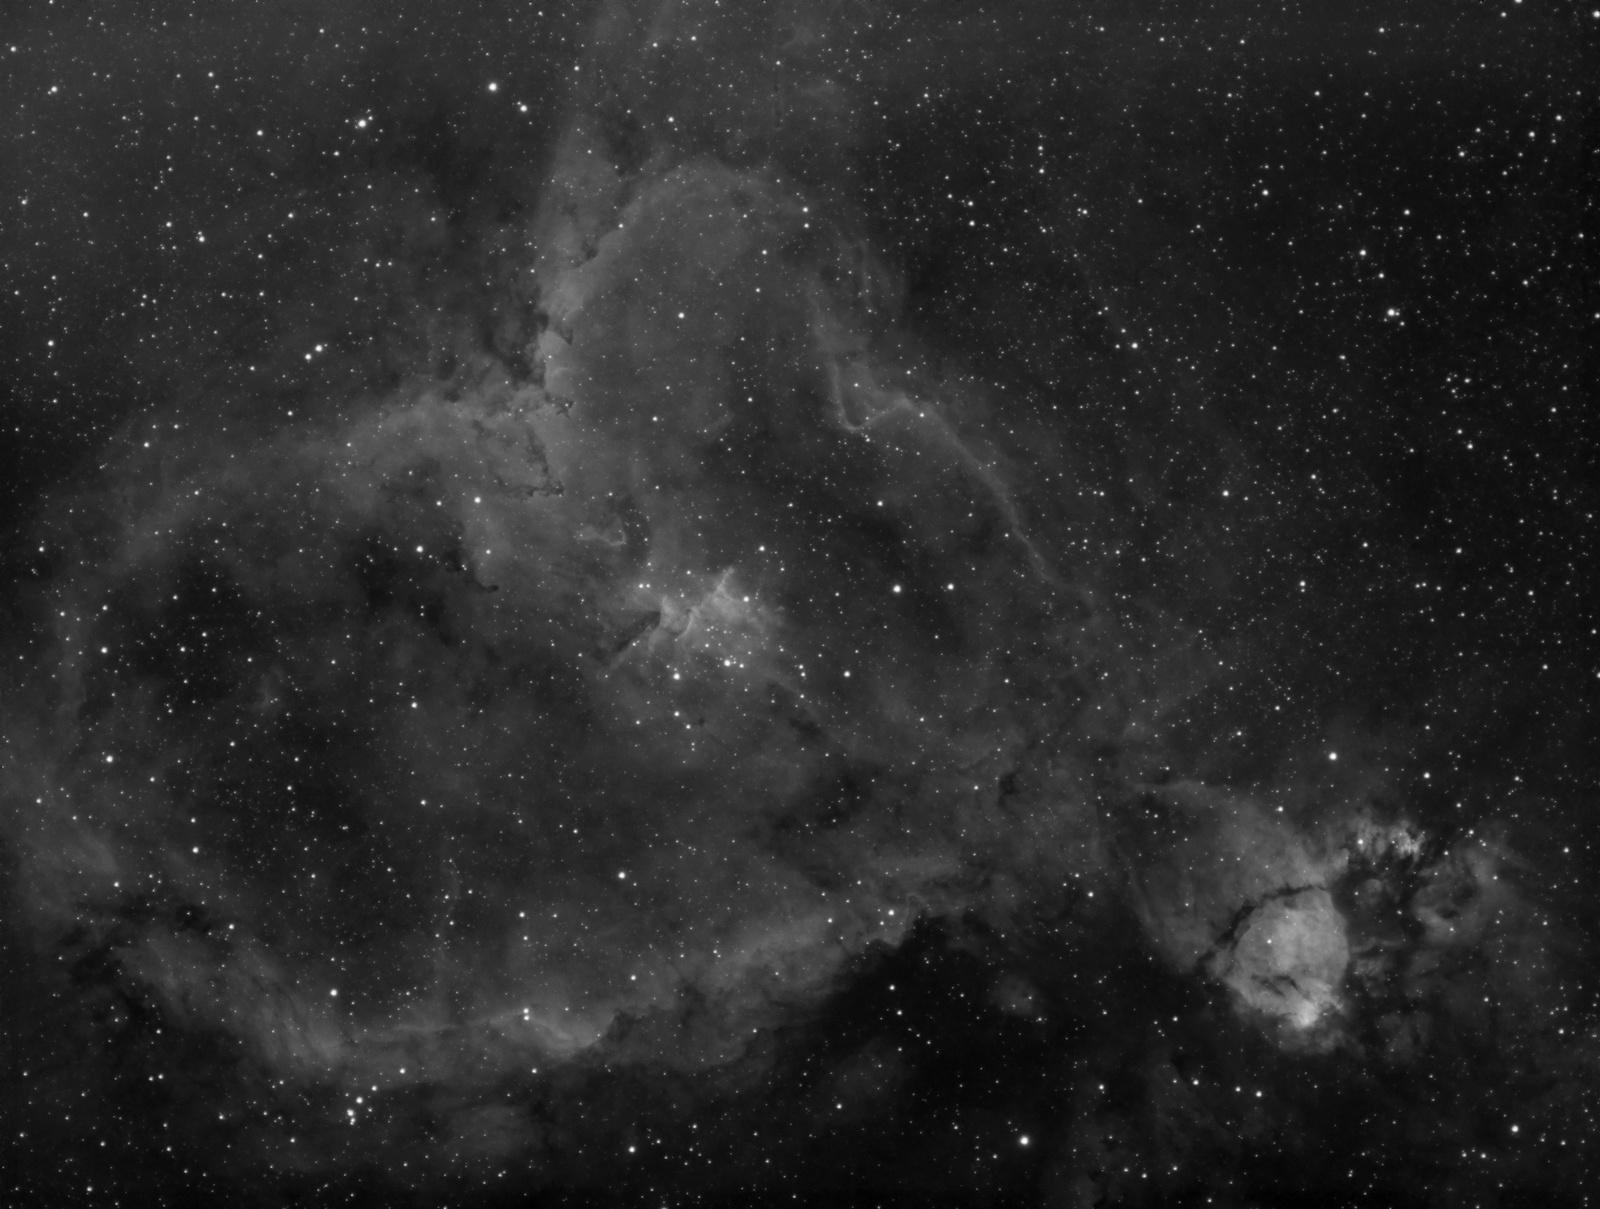 IC1805_Ha.thumb.jpg.a2c98a44d4ffd77ea922154e4b9e6cc0.jpg